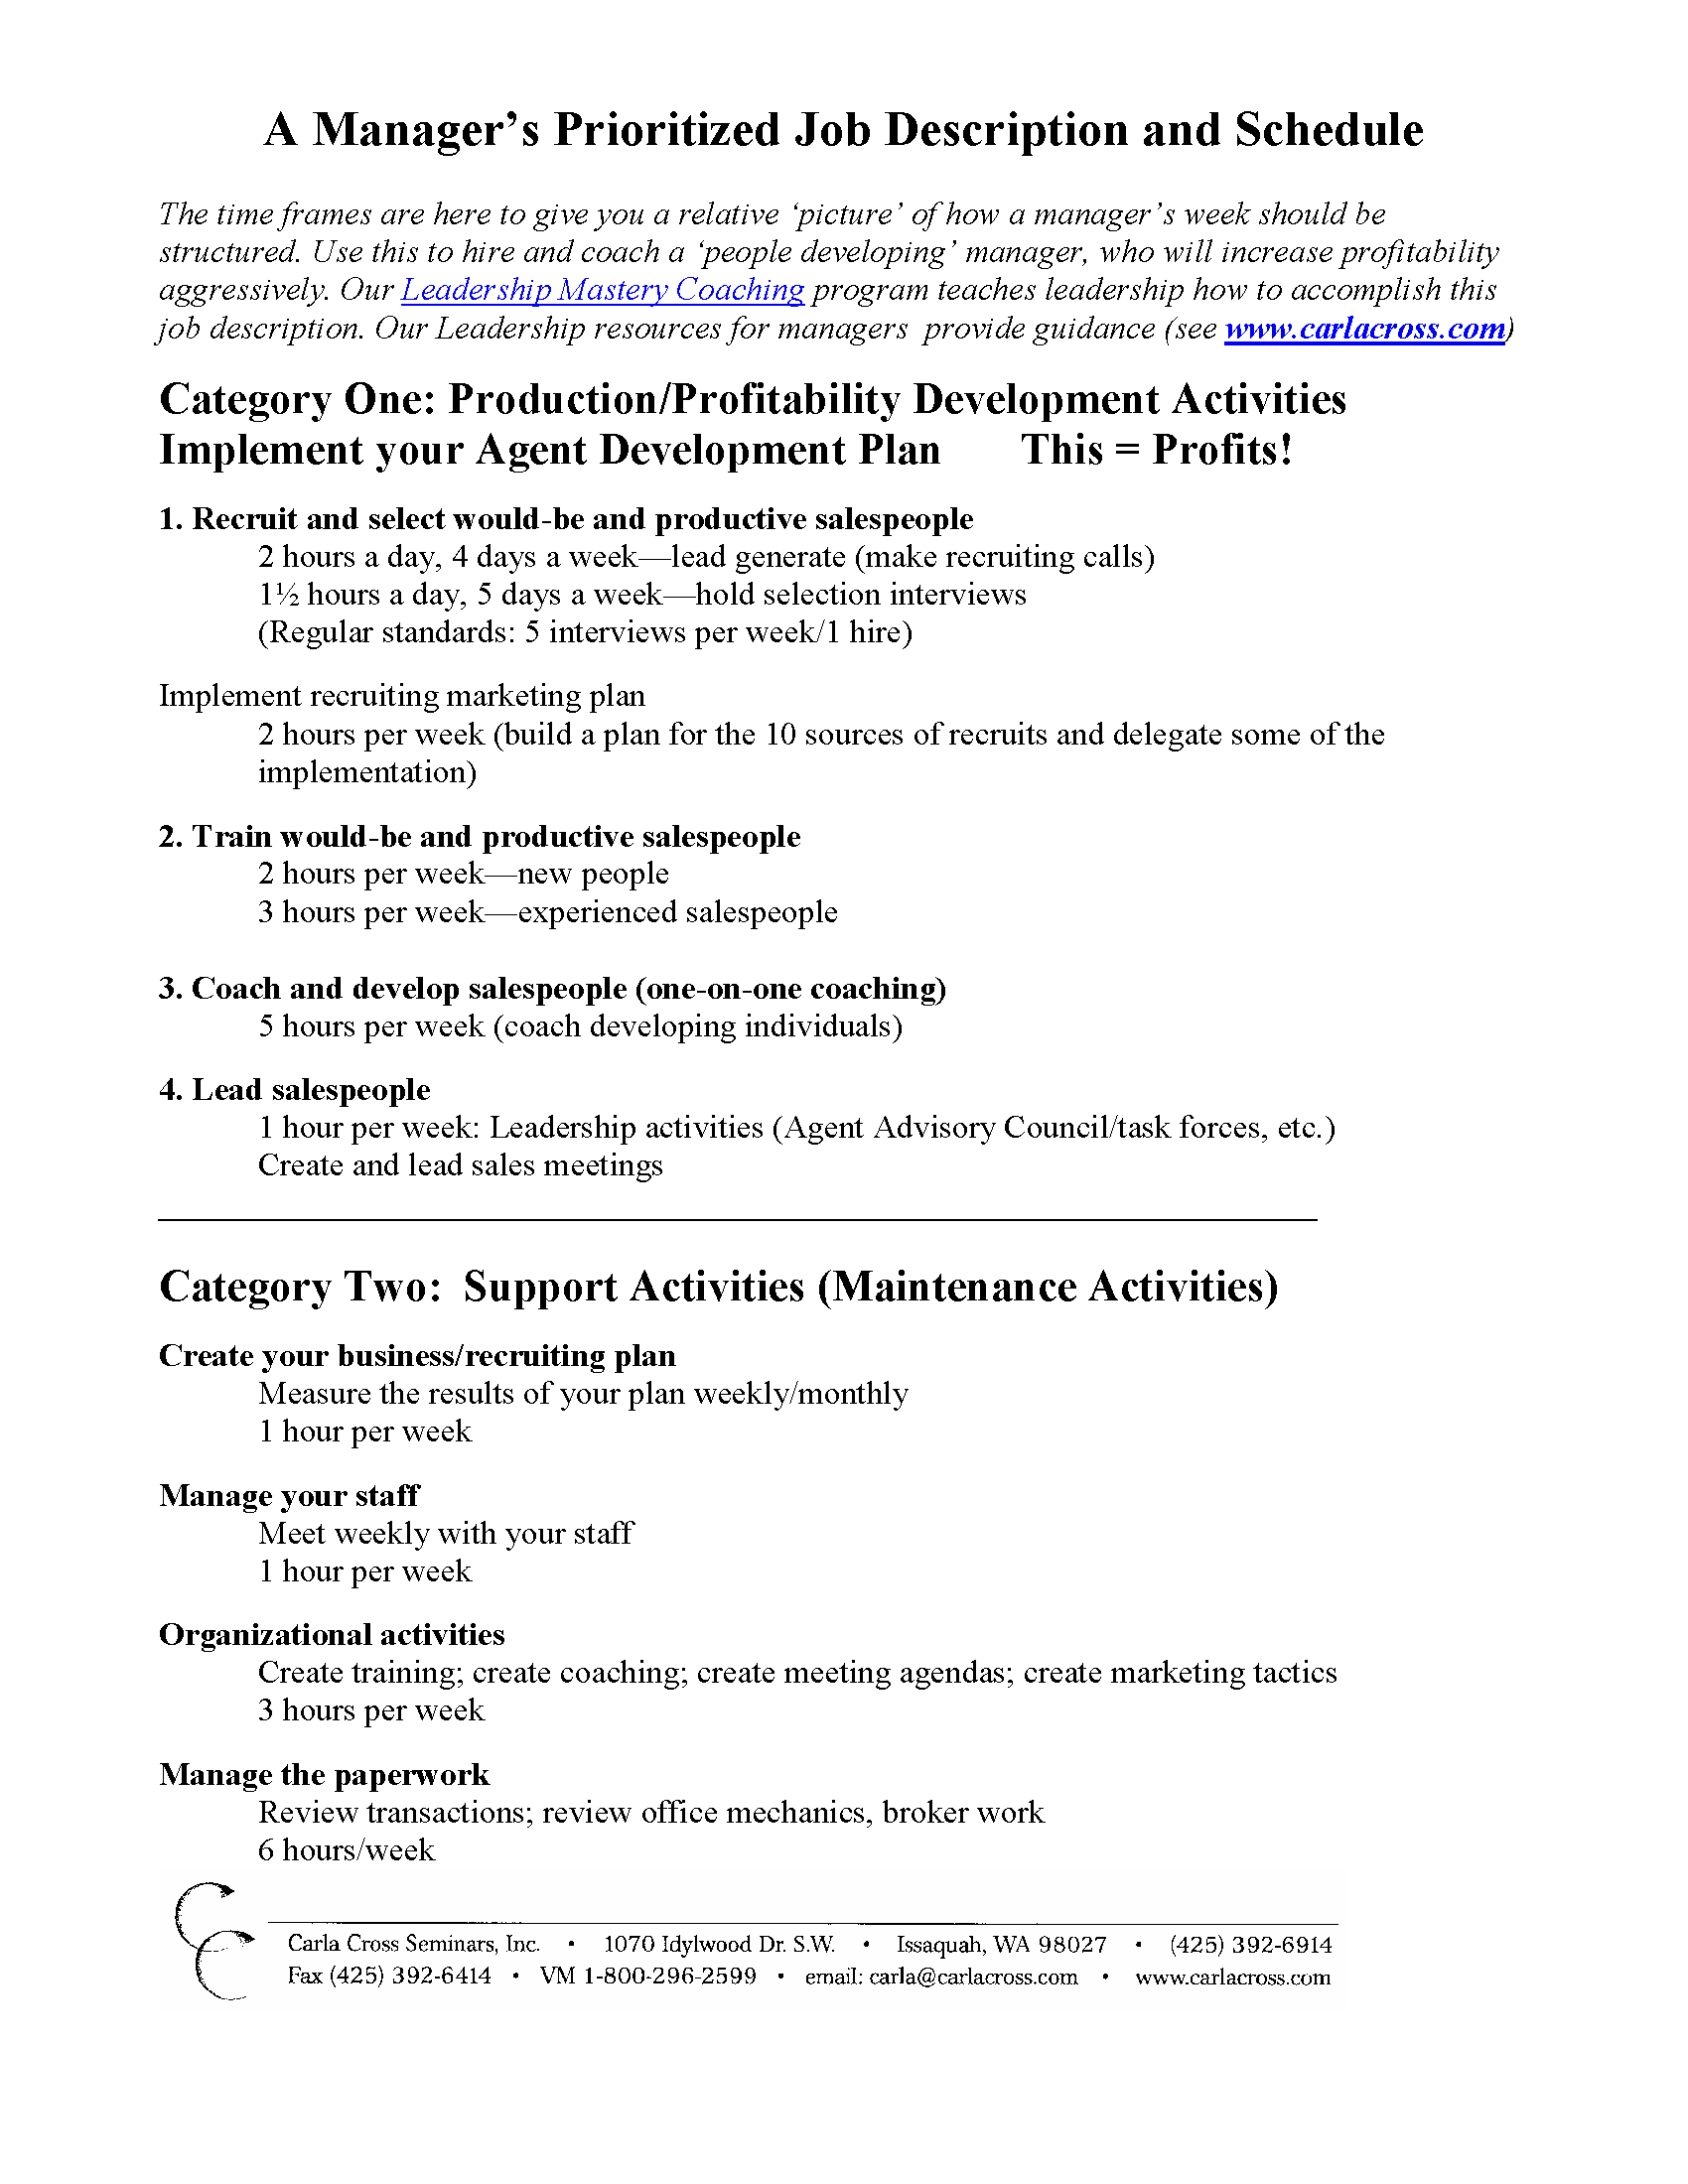 Doc638826 Athletic Director Job Description Athletic director – Development Director Job Description